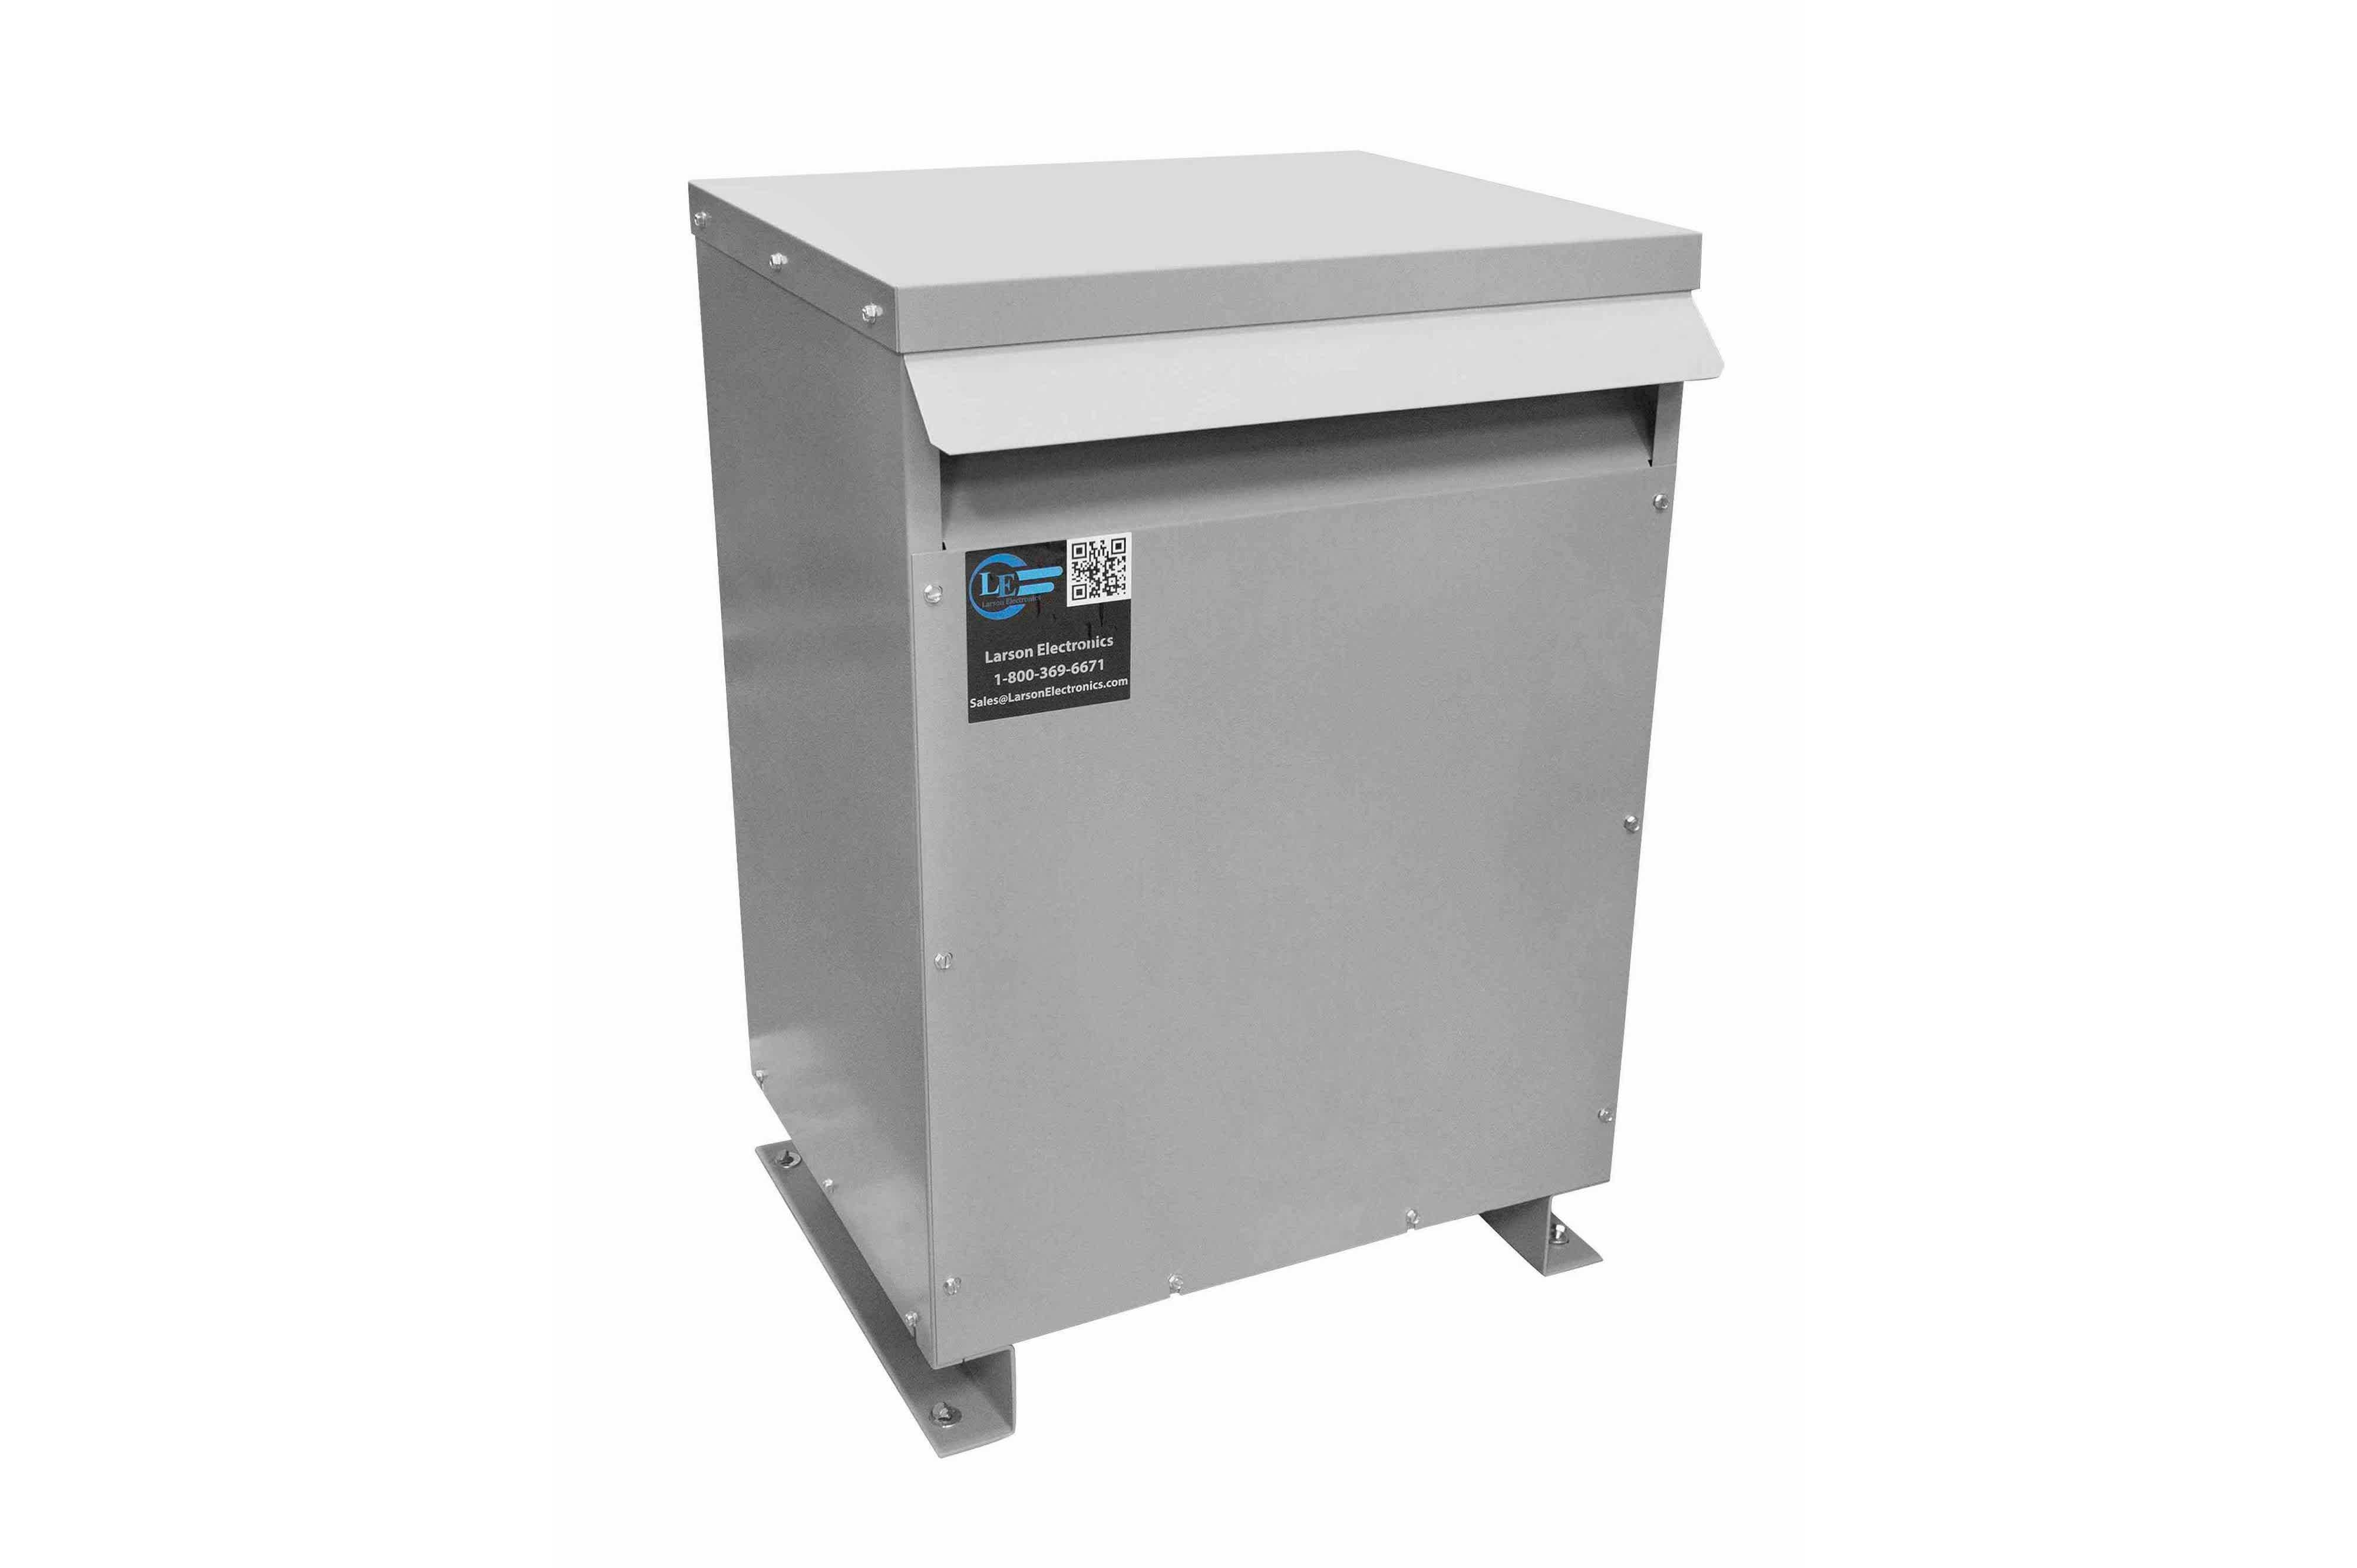 30 kVA 3PH Isolation Transformer, 480V Wye Primary, 208Y/120 Wye-N Secondary, N3R, Ventilated, 60 Hz